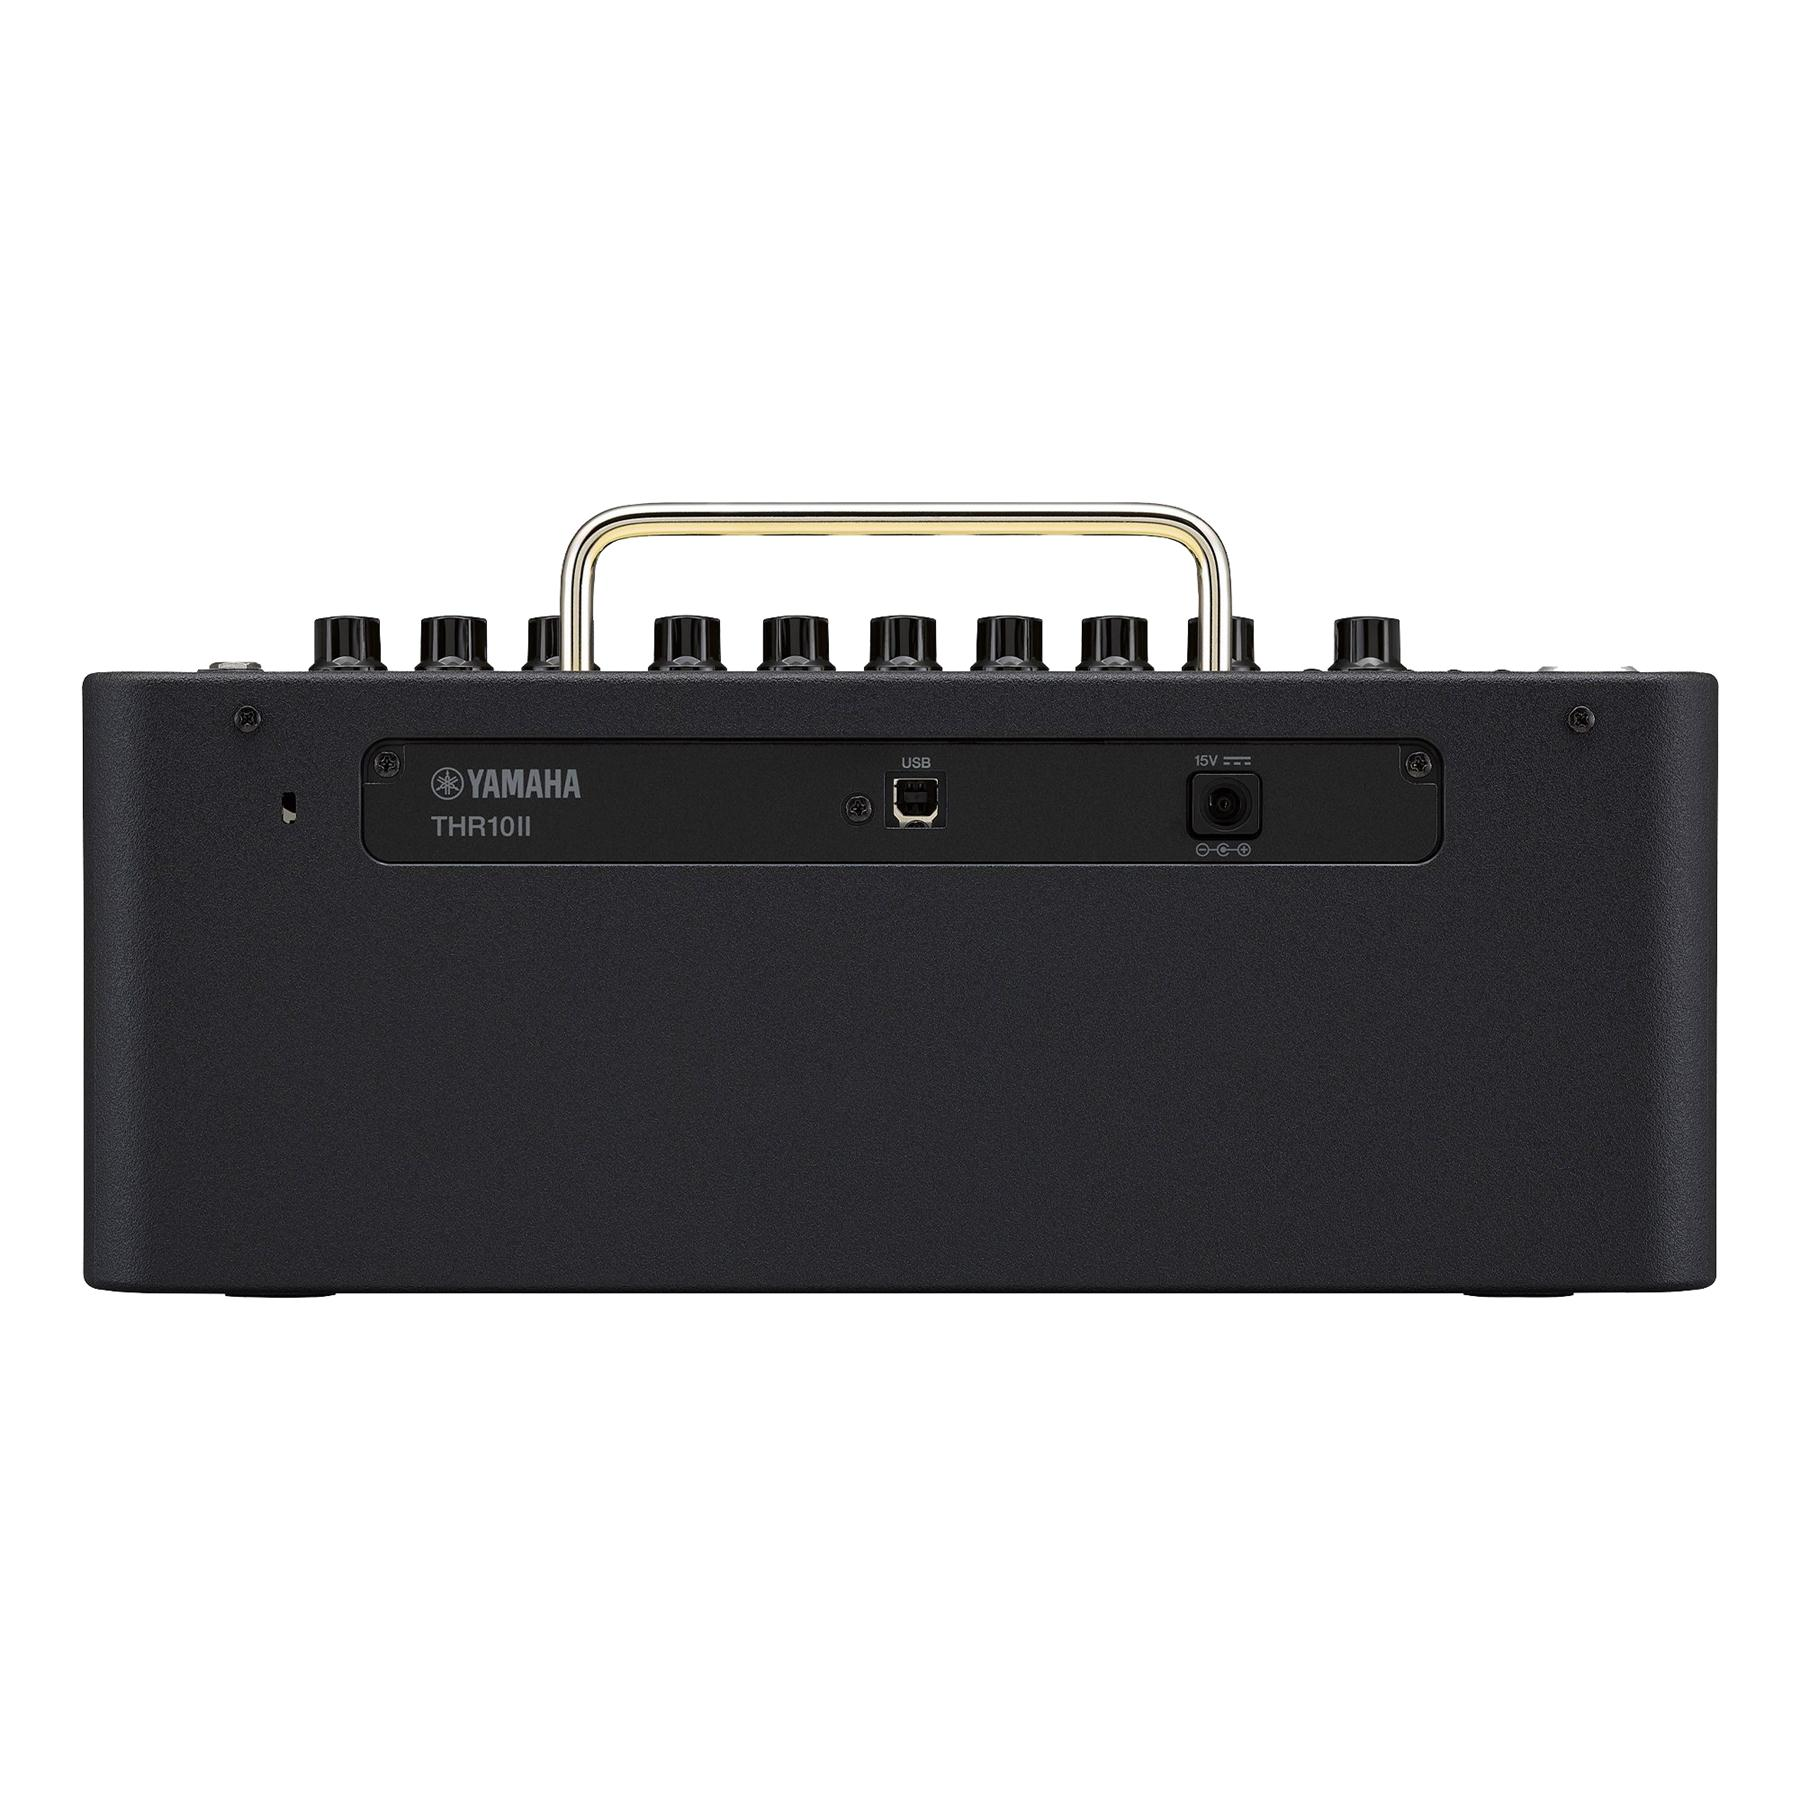 Yamaha Amplificador Cubo para Guitarra THR10II (20w RMS/Bluetooth)